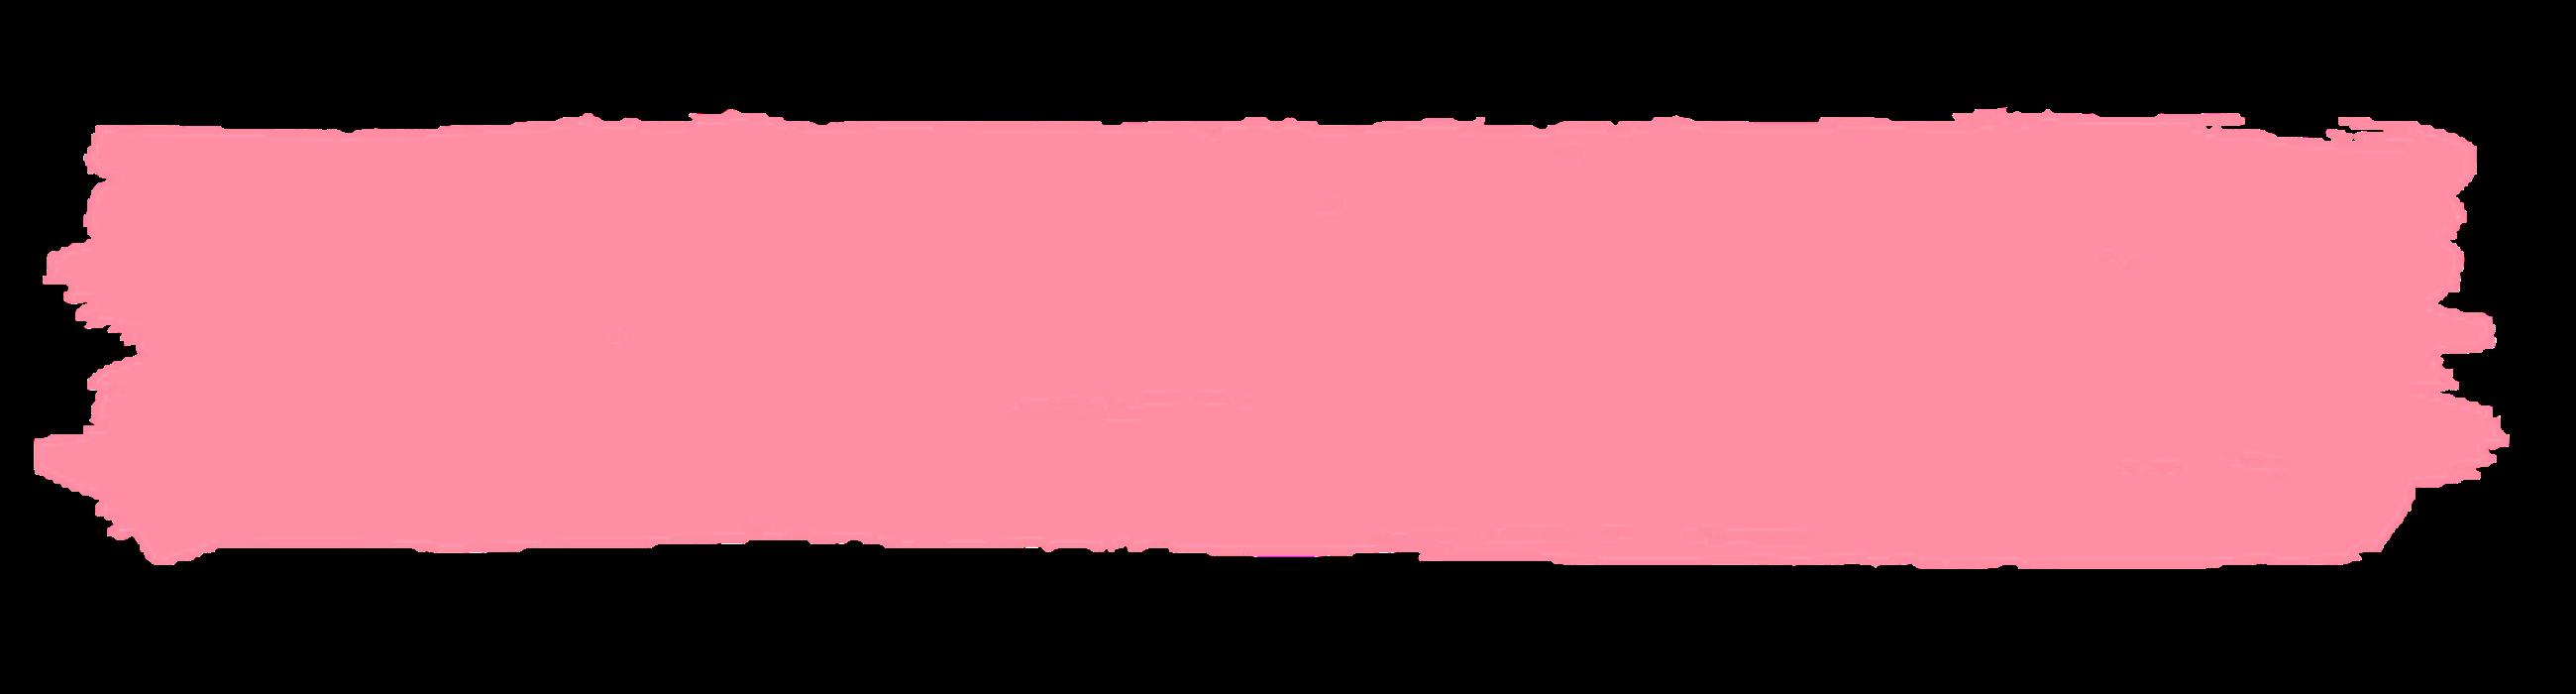 bildslide